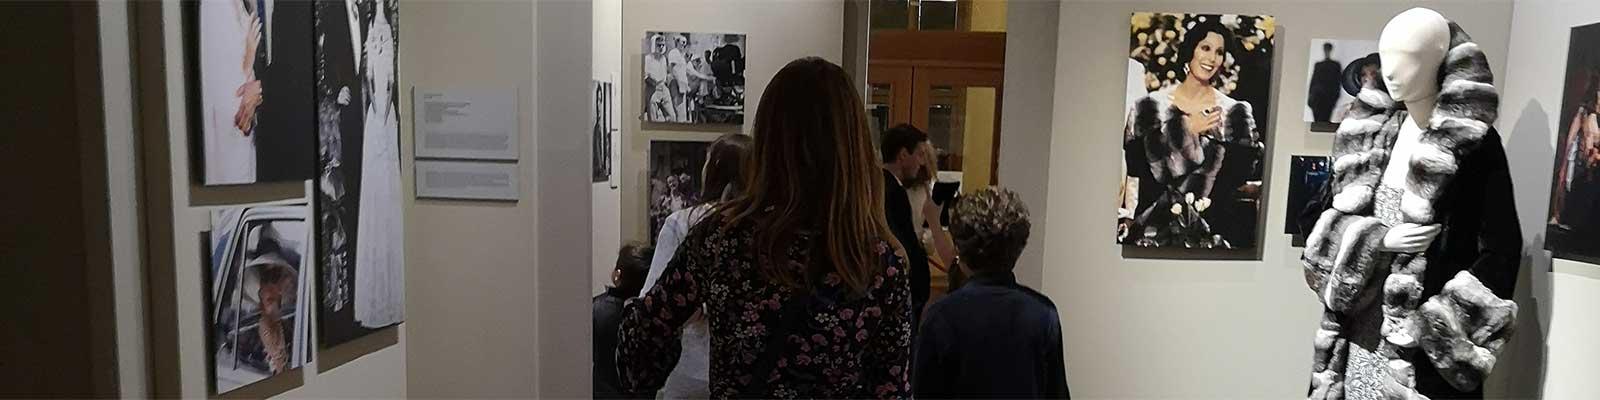 Famiglie al Museo Zeffirelli